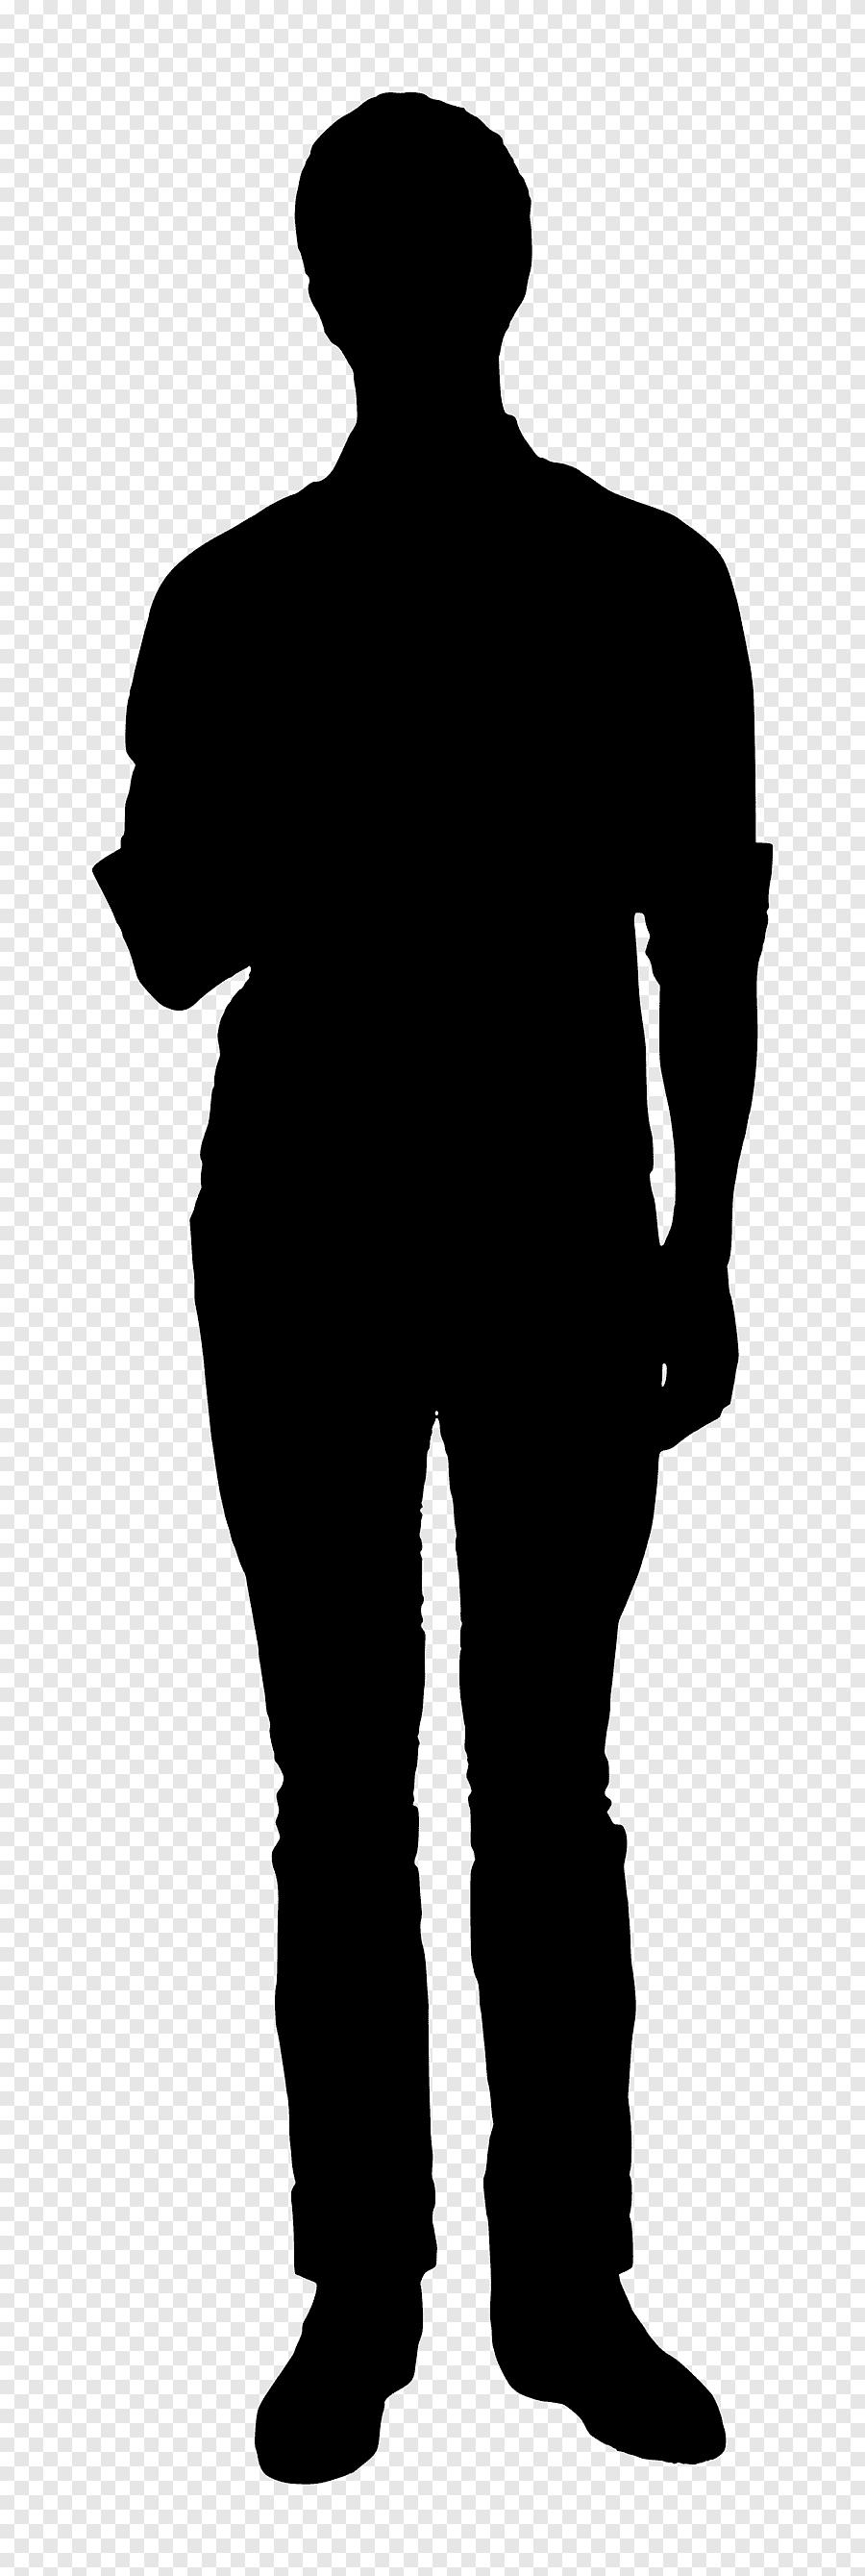 personne silhouette silhouette noir